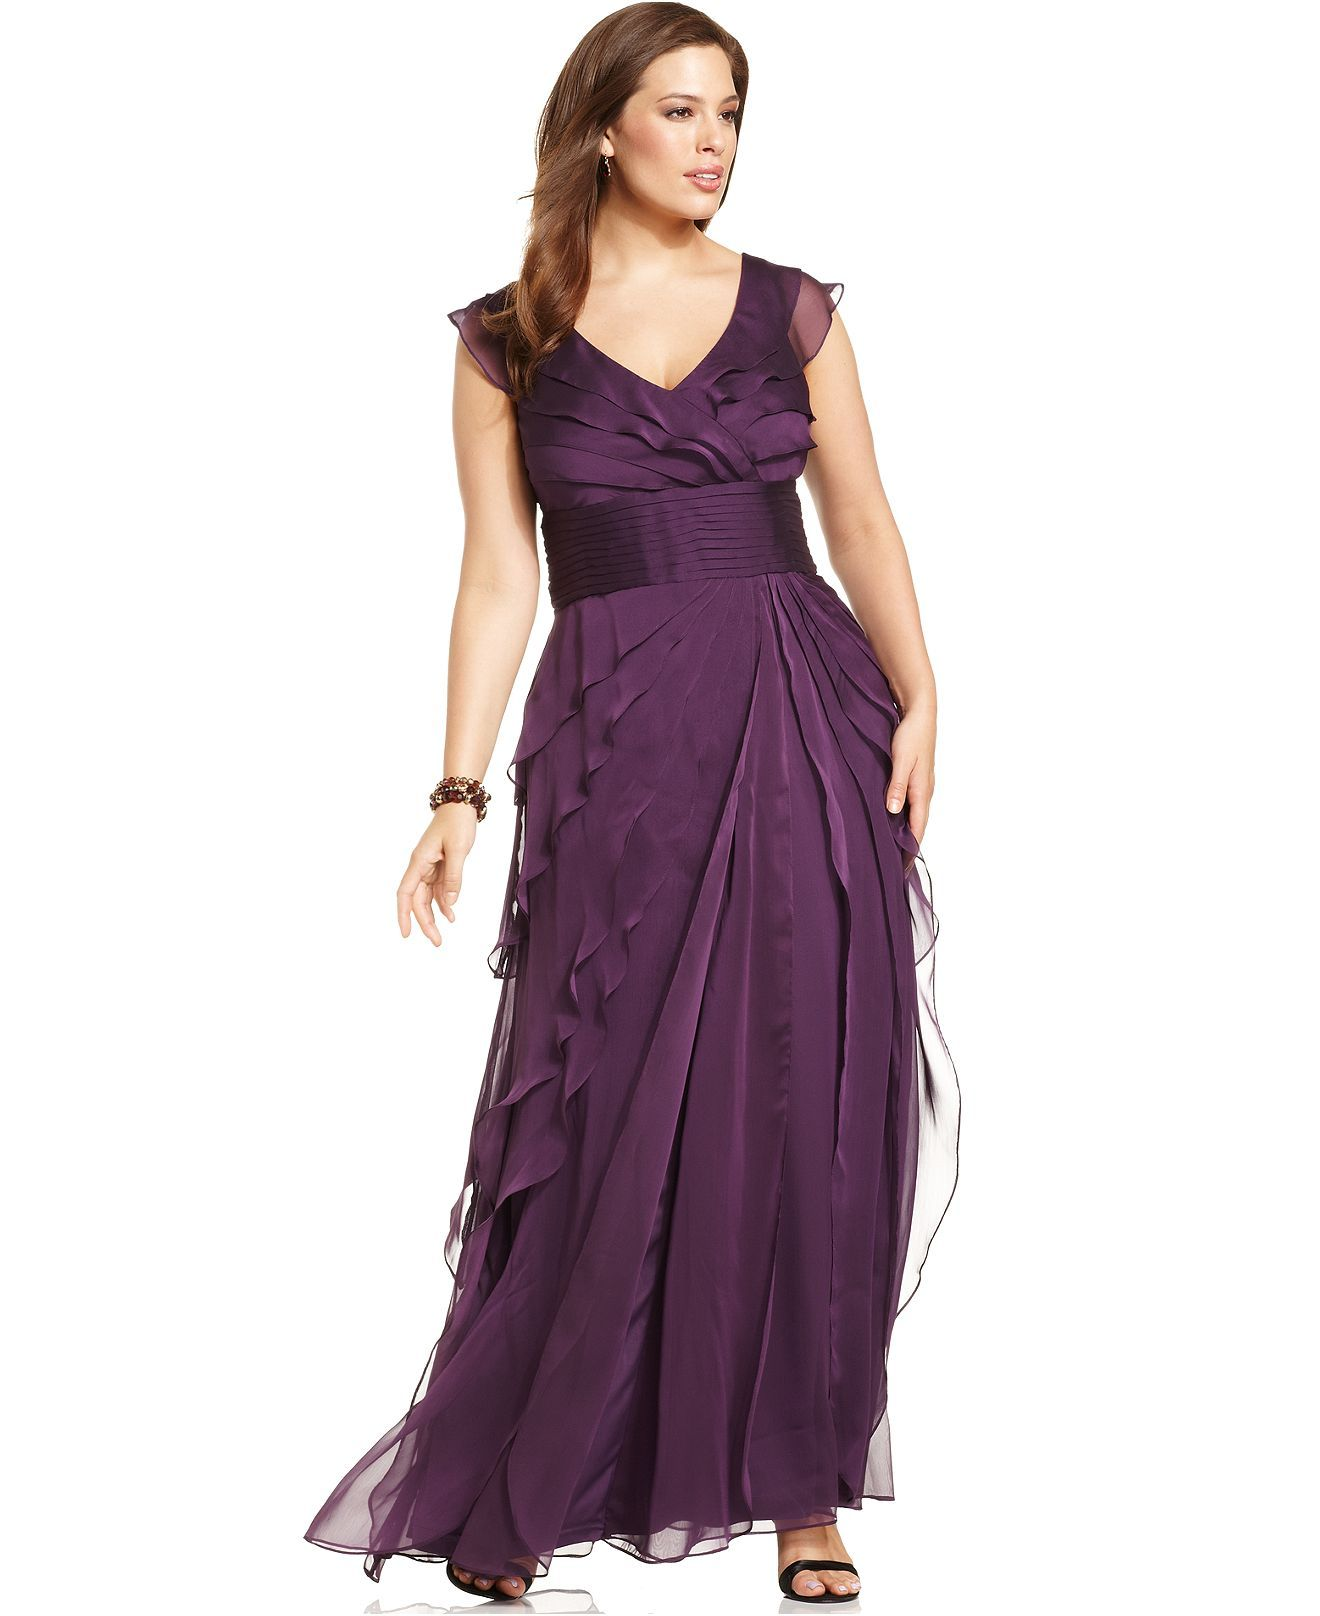 Adrianna Papell Plus Size Dress Sleeveless Tiered Empire Waist